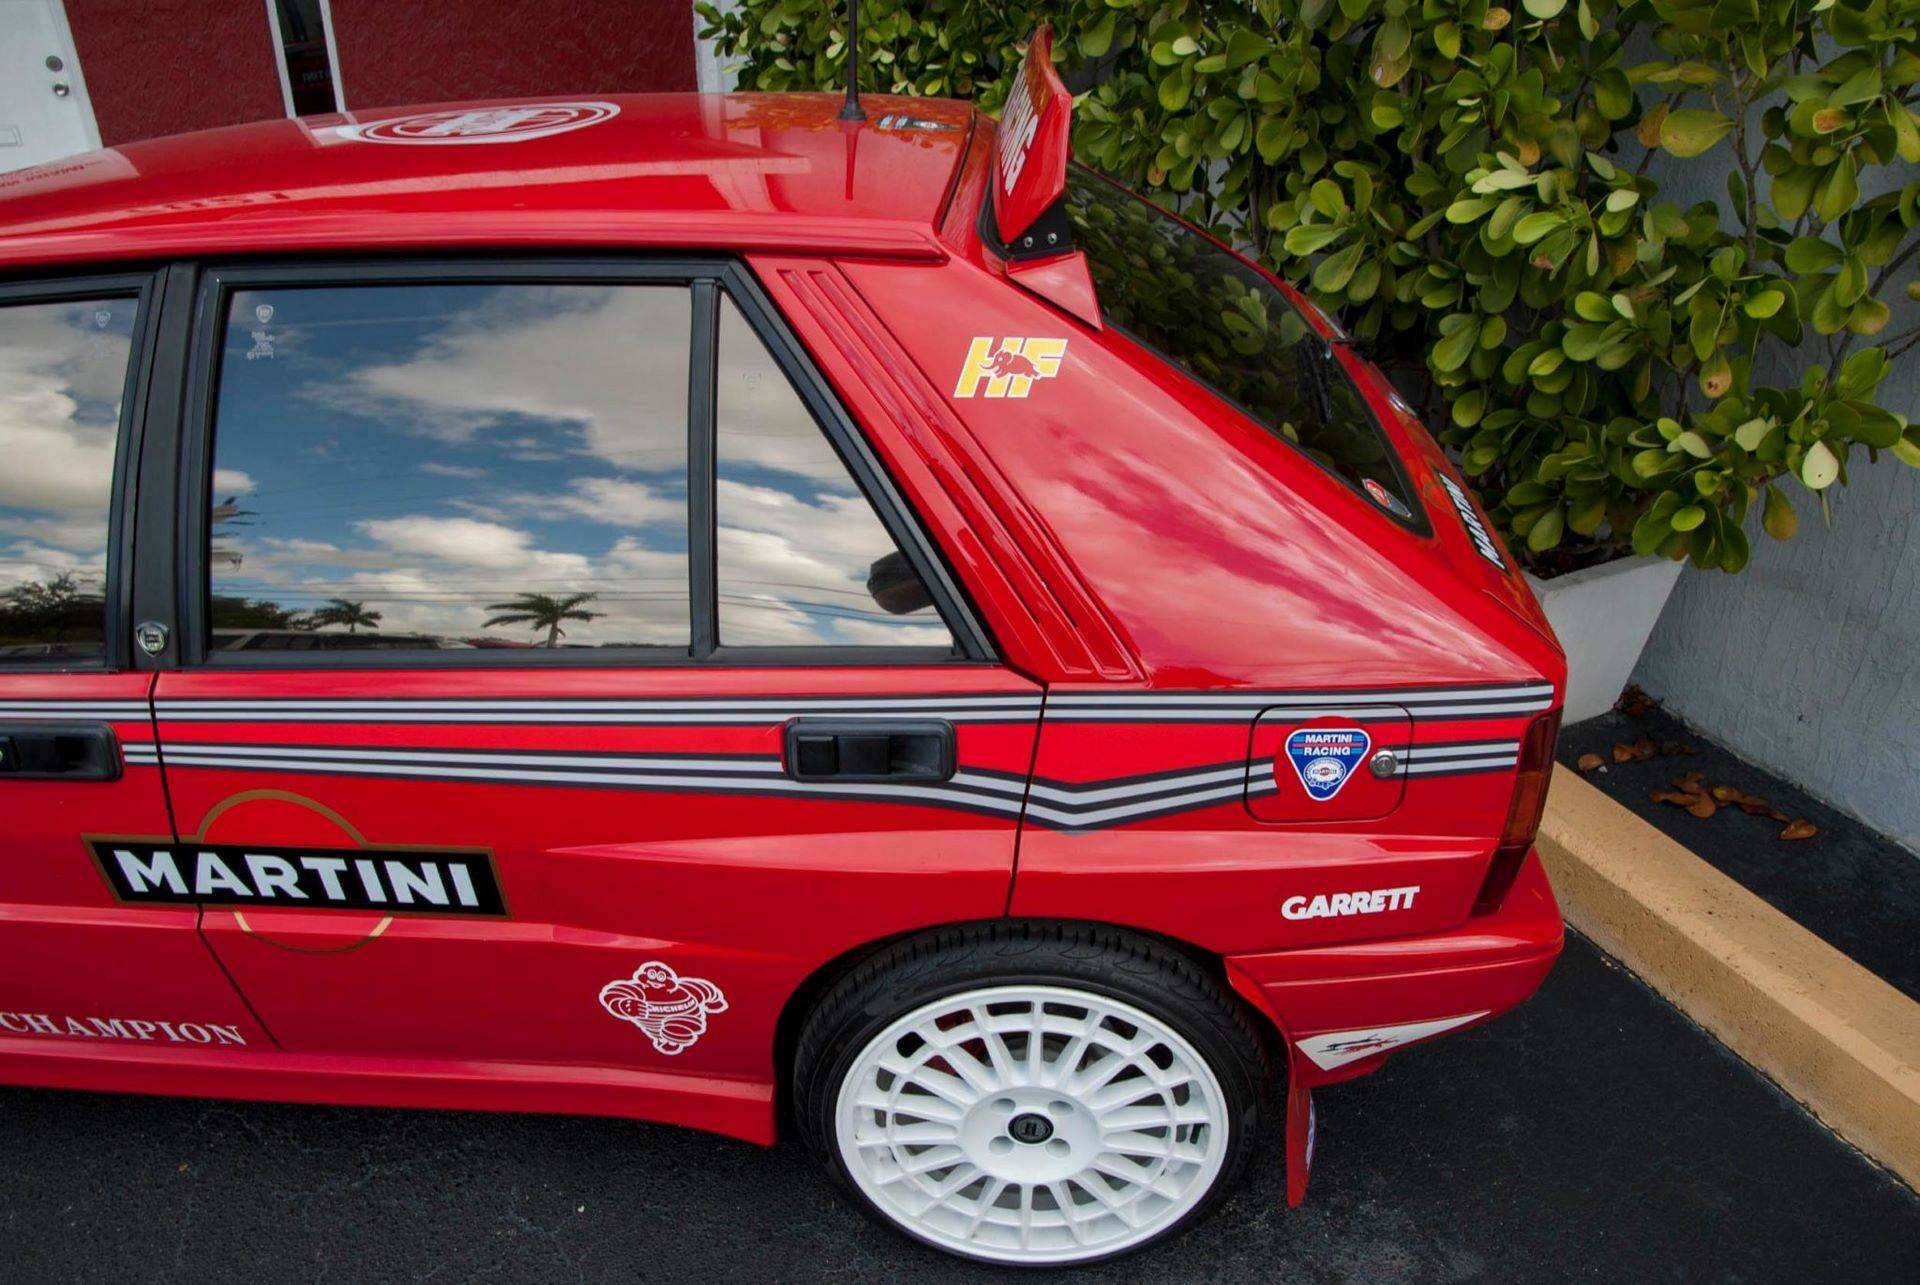 Lancia-Delta-Integrale-8V-1989-86